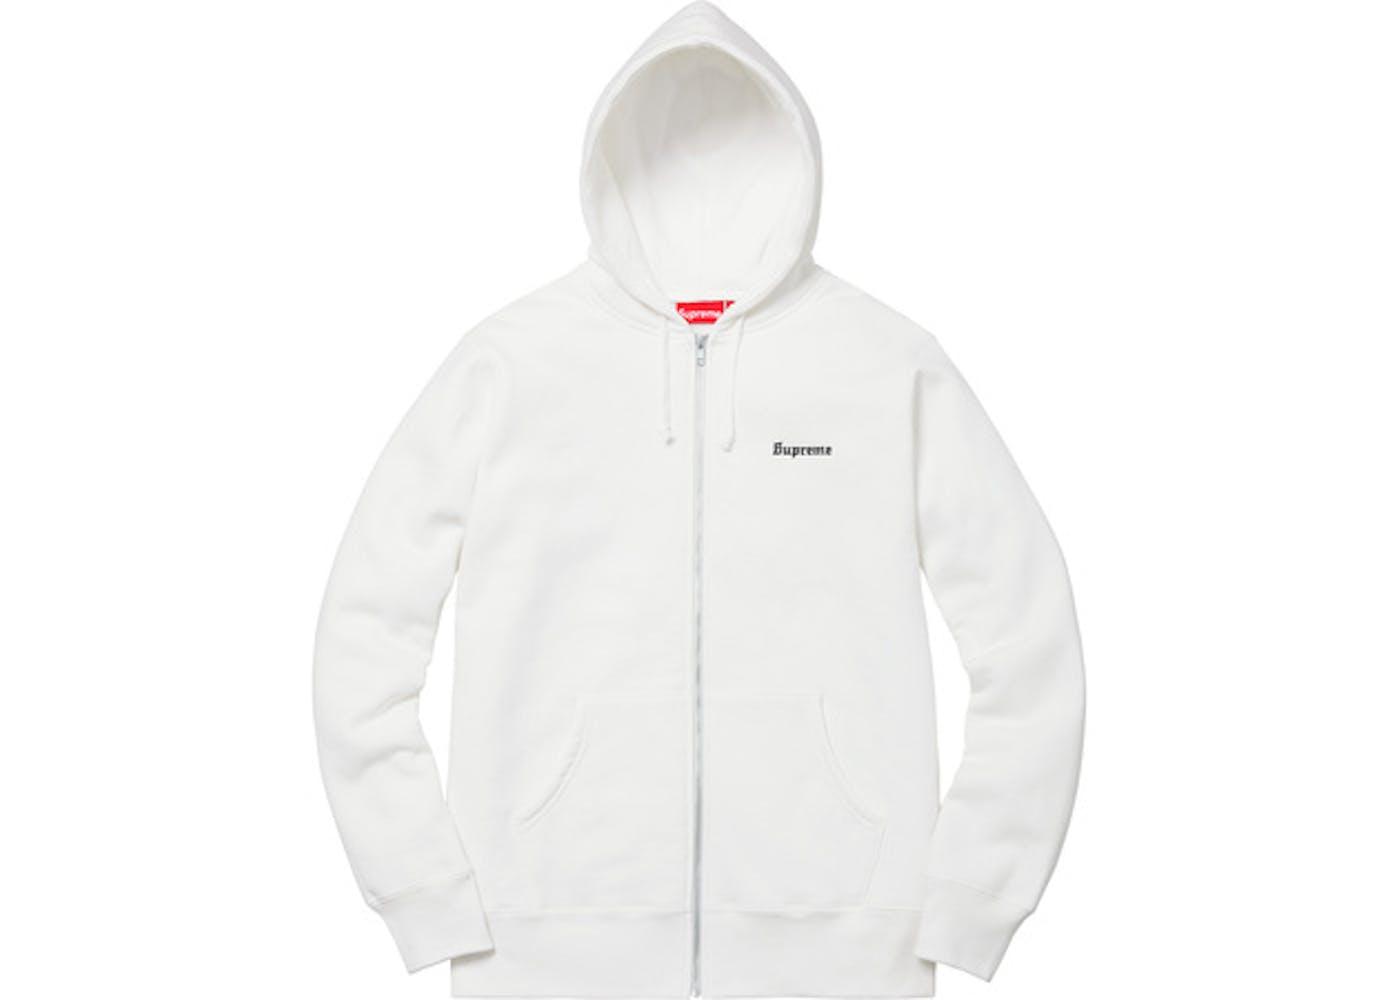 666 Zip Up Hooded Sweatshirt White